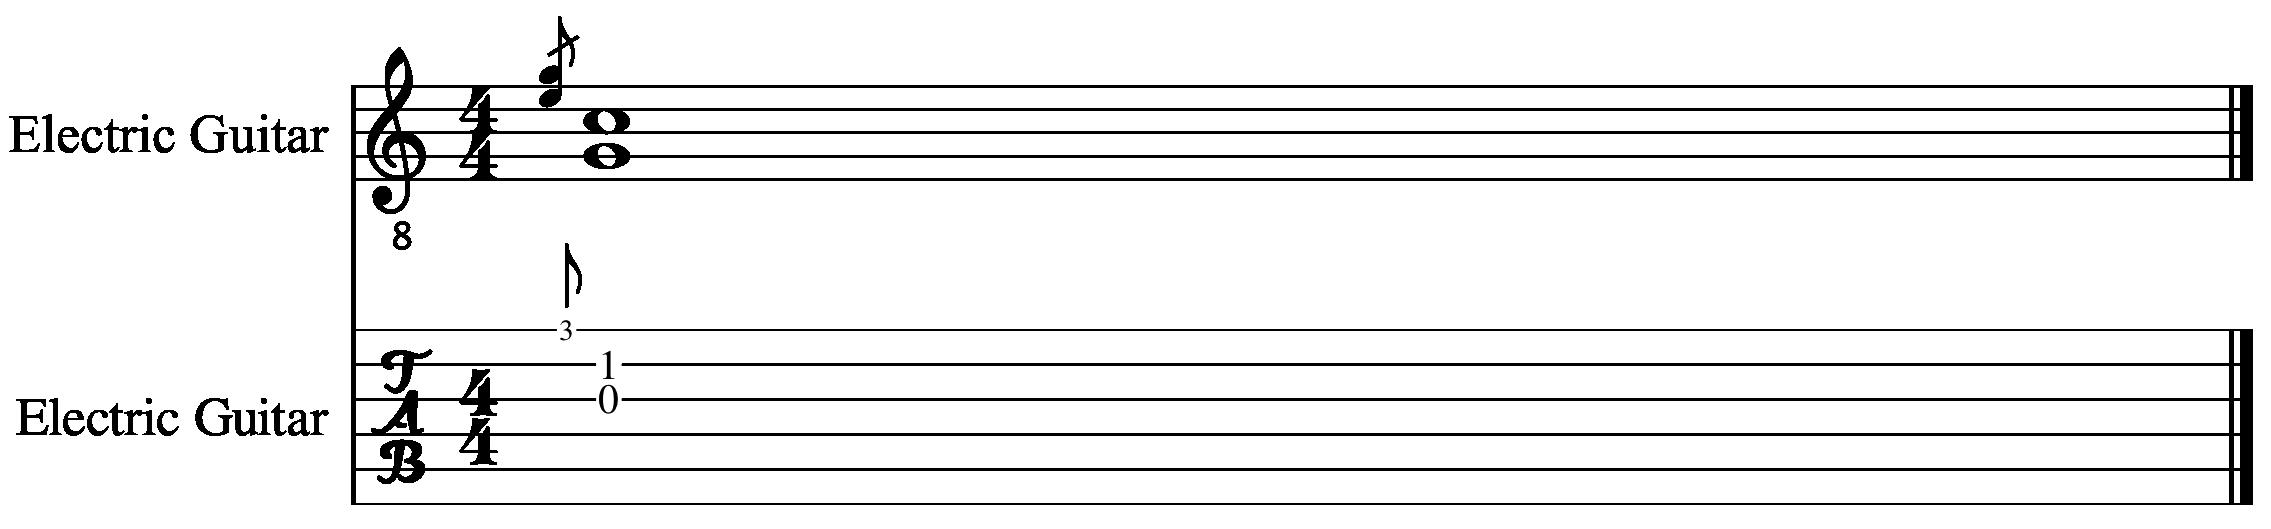 Cannot create grace note chord in tablature musescore cannot create grace note chord in tablatureg hexwebz Gallery